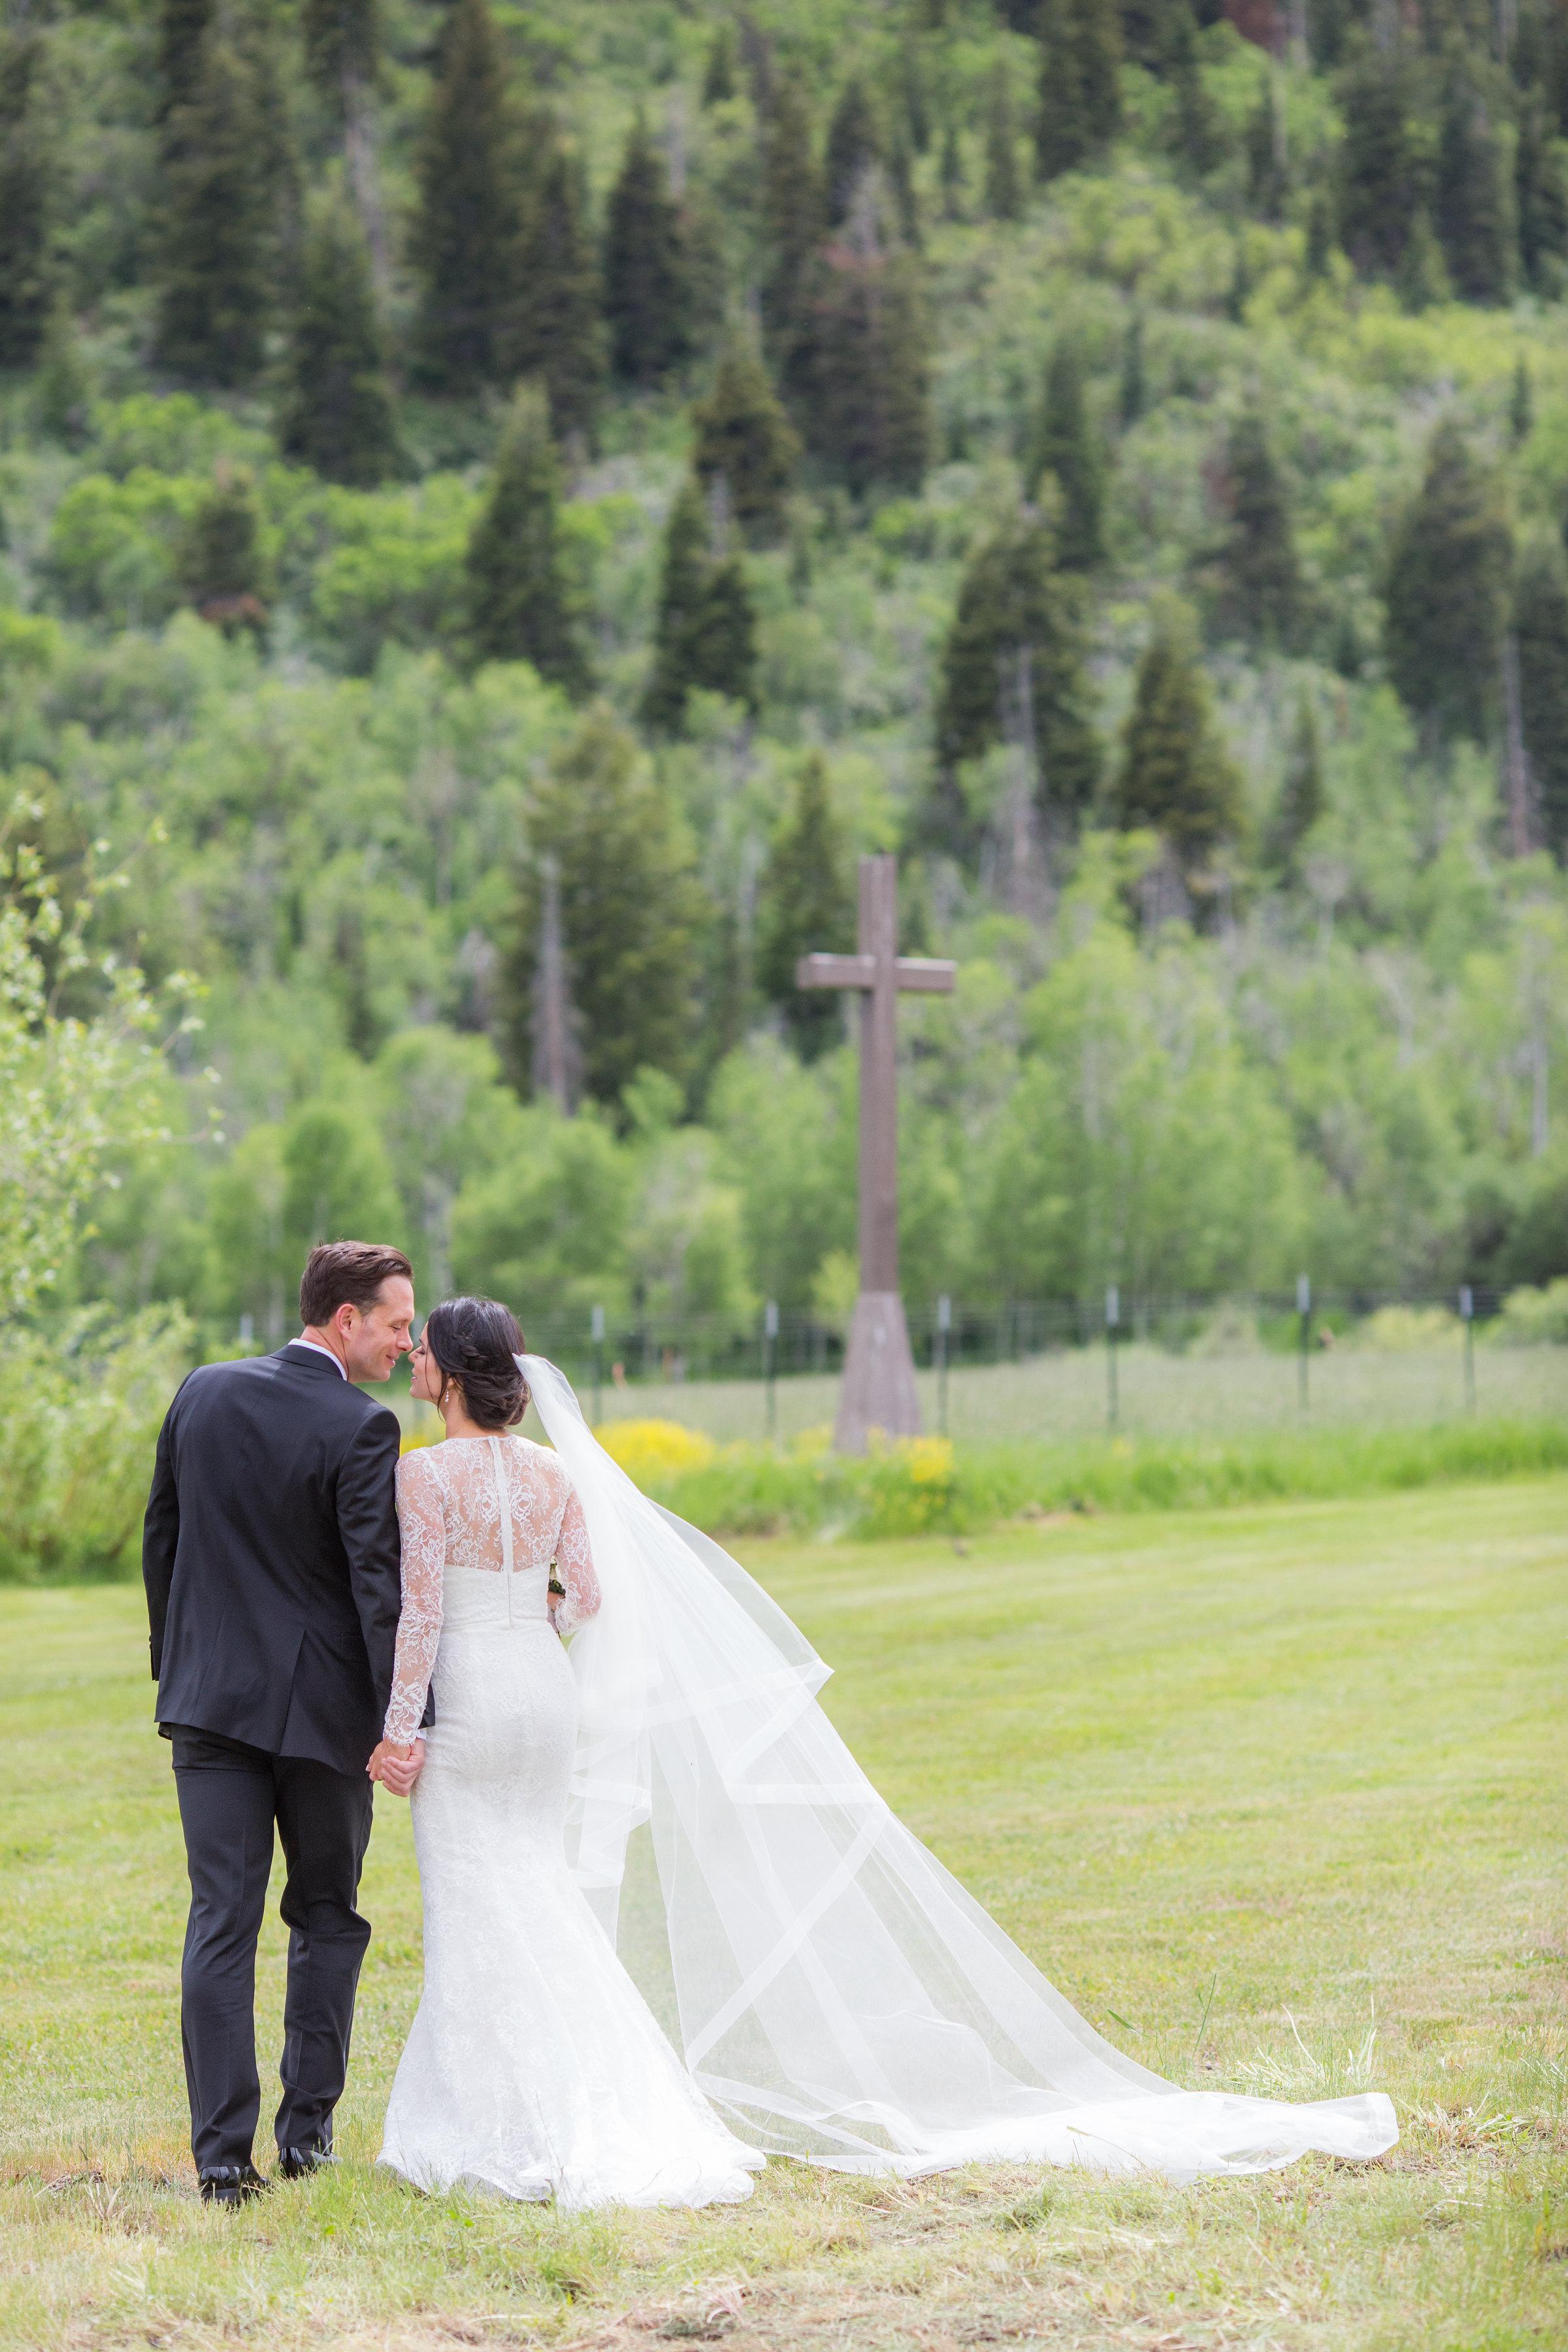 Summer Wedding at the Montage   Montage Deer Valley Wedding   Park City Wedding   Michelle Leo Events   Utah Event Planner and Designer   Erin Kate Photography